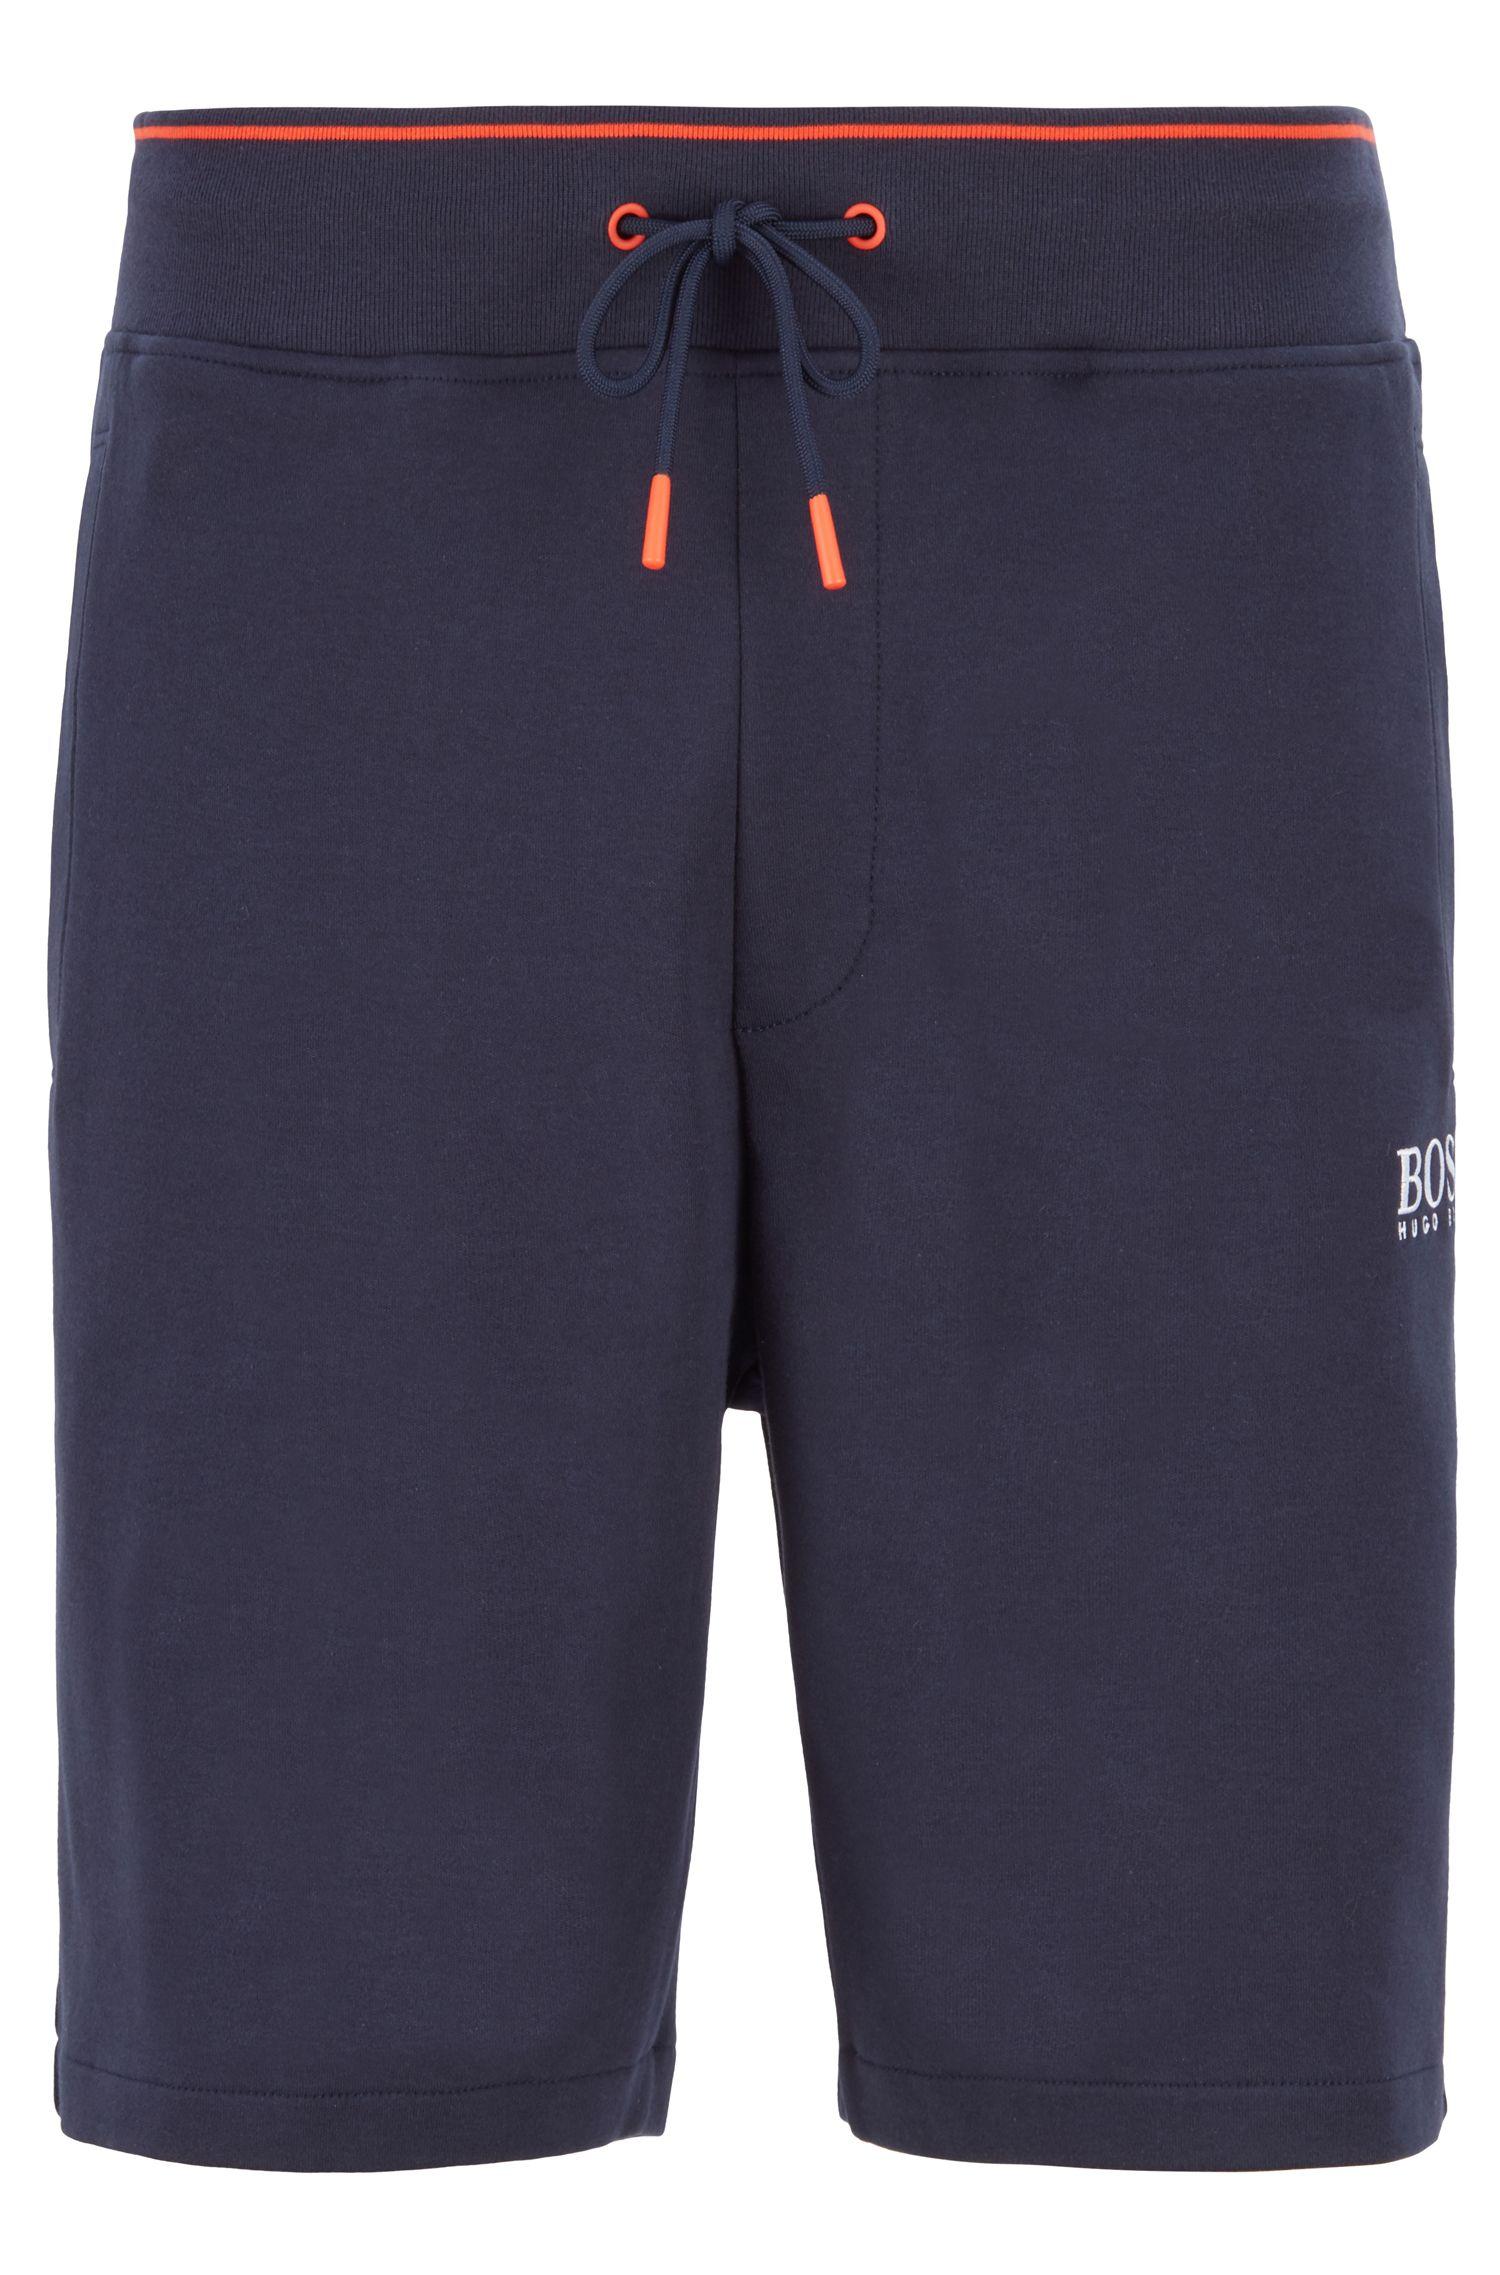 Loungewear-Shorts mit Coolest-Comfort-Finish, Dunkelblau